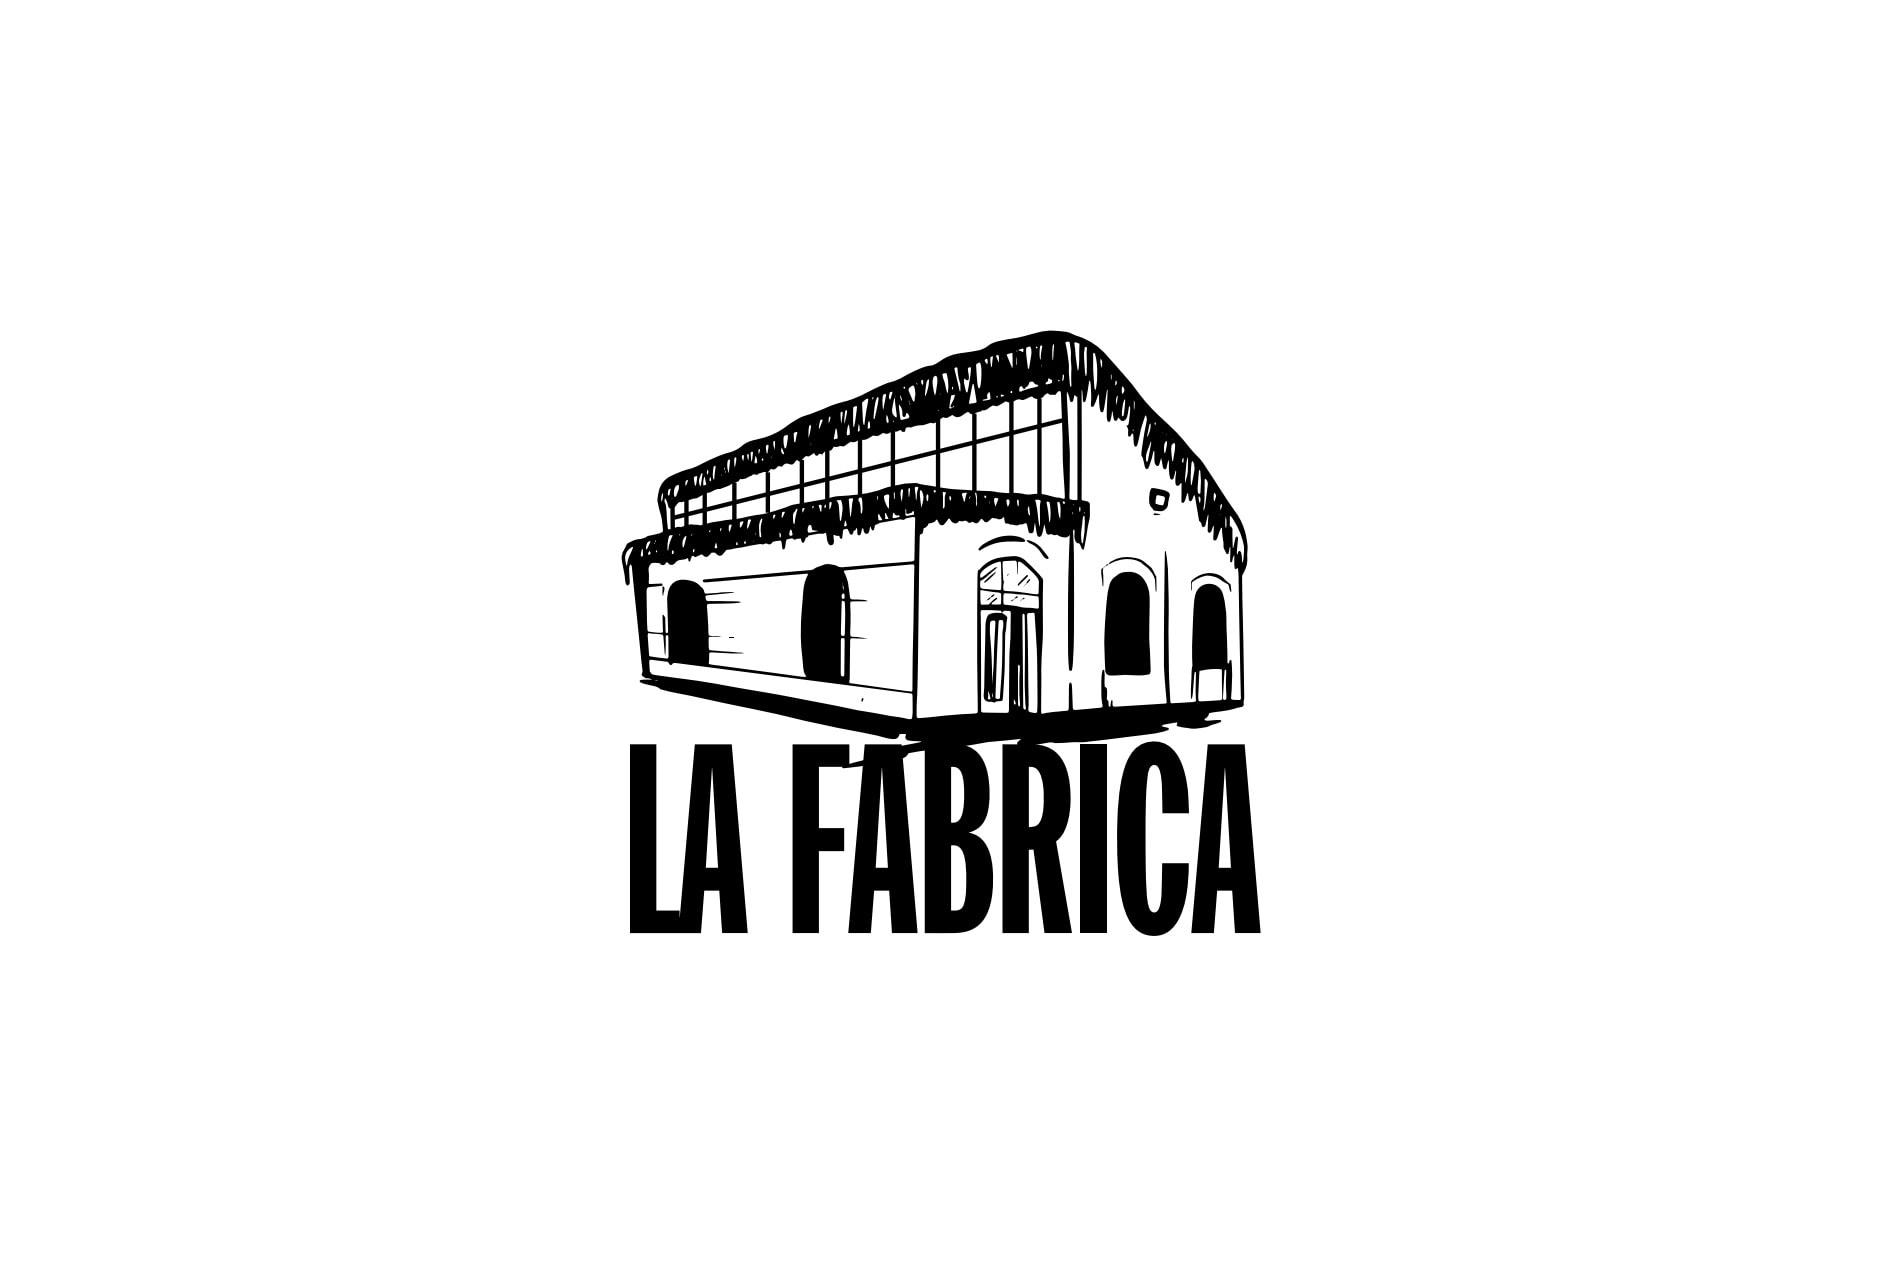 Sinistro Cigars Launches La Fabrica Series Featured Image